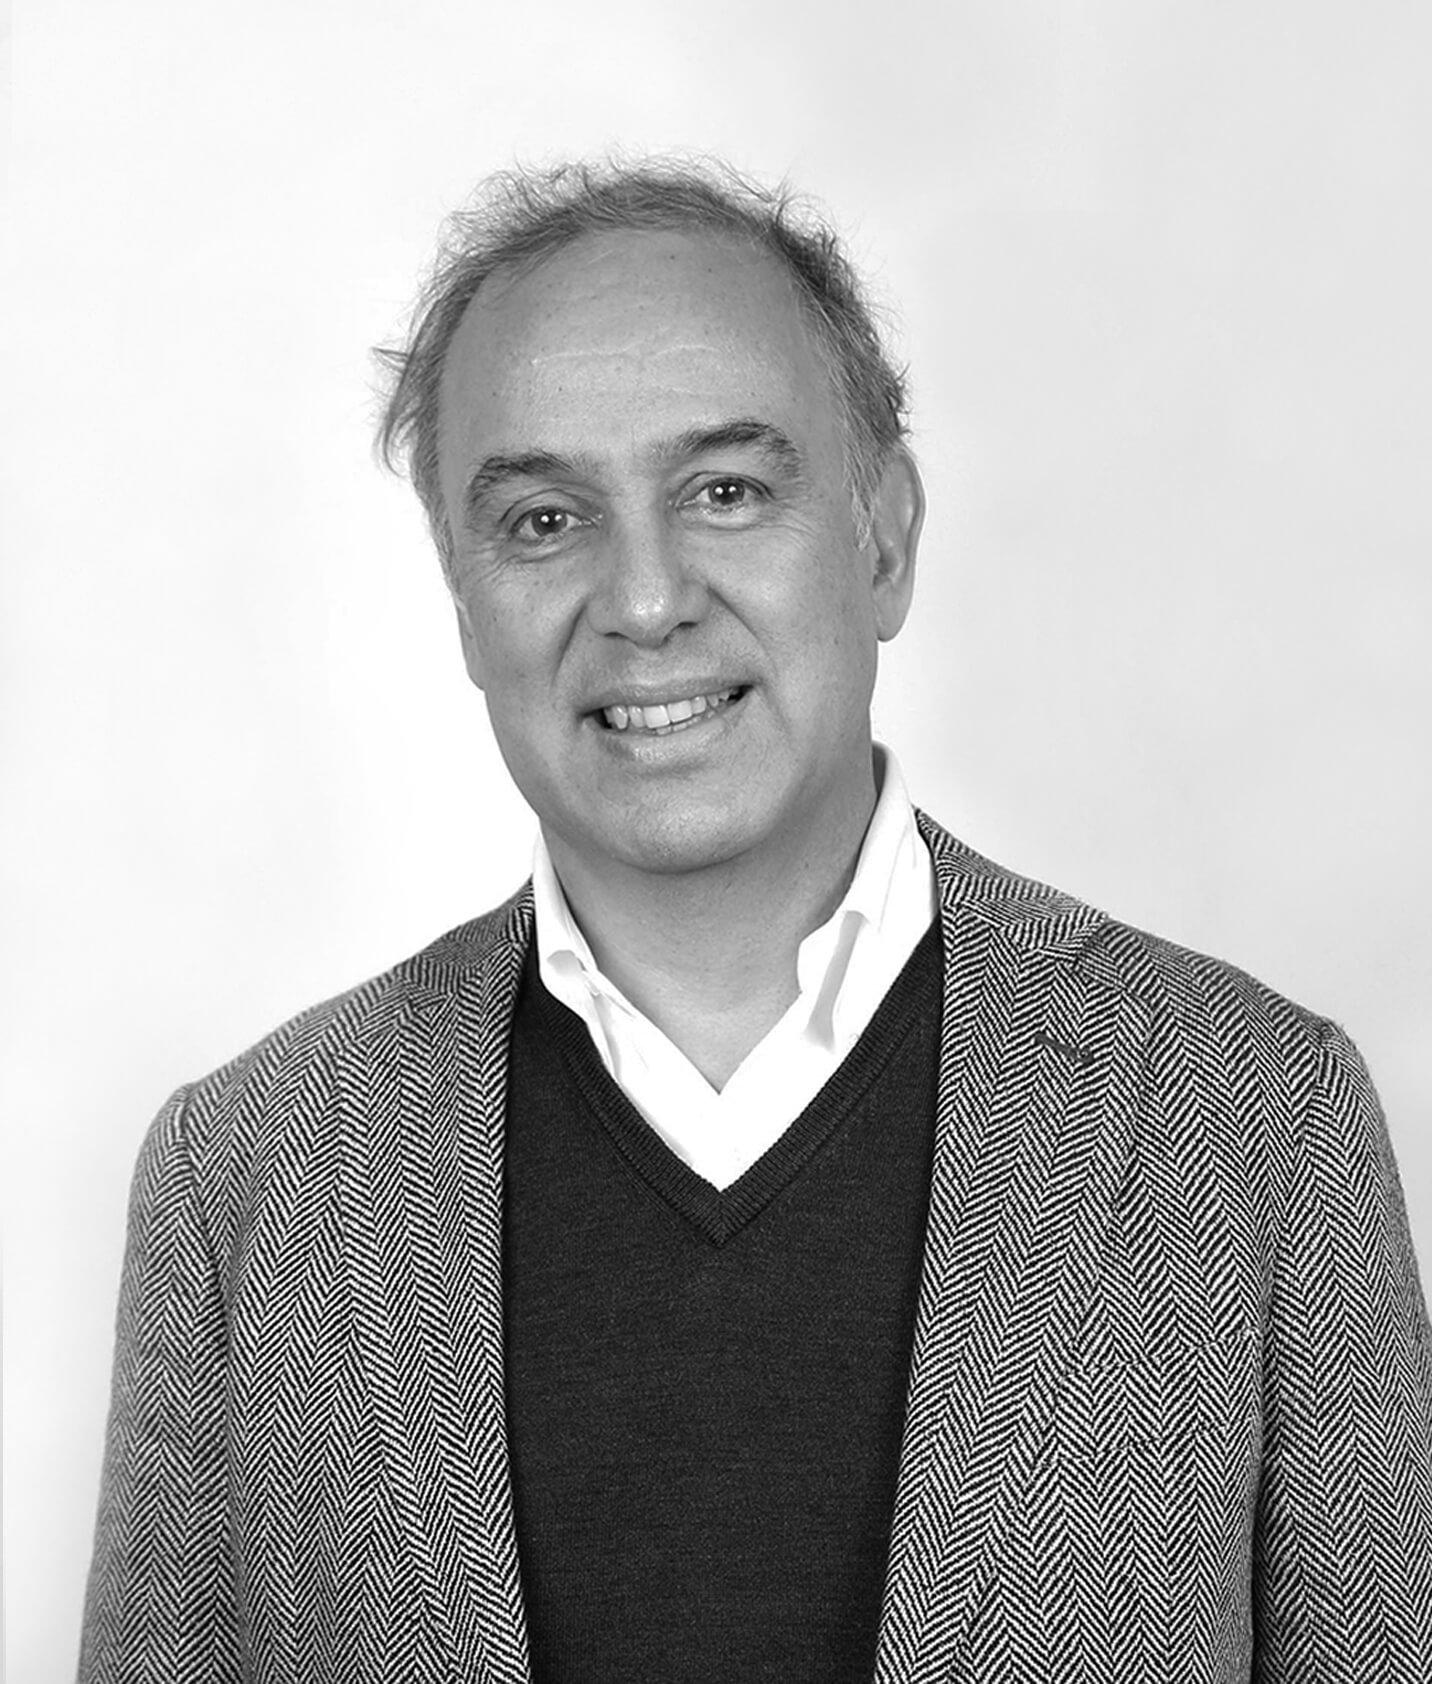 Emilio-Sierpe-Cerrando-Brechas